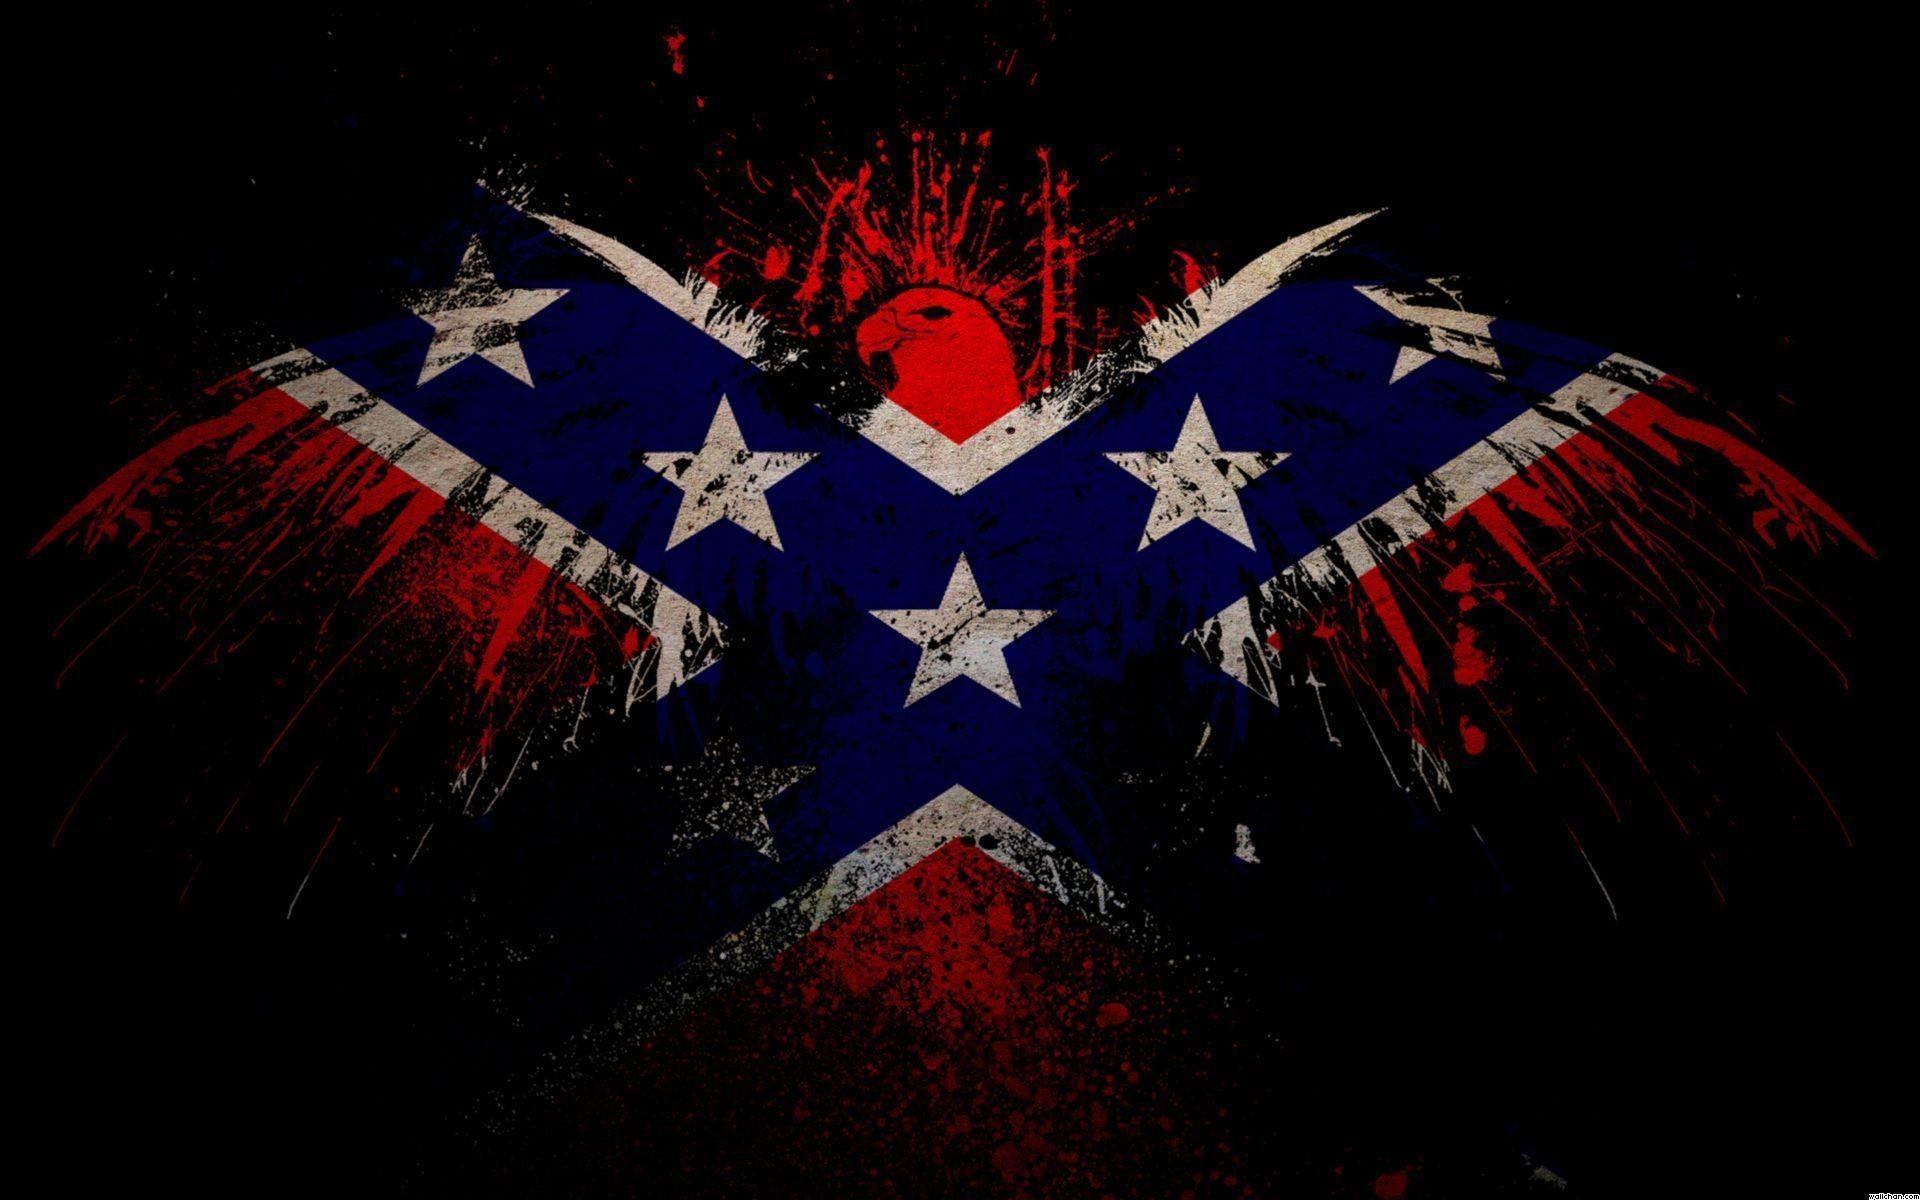 Rebel Flag Wallpaper Download Free Stunning Hd Backgrounds For